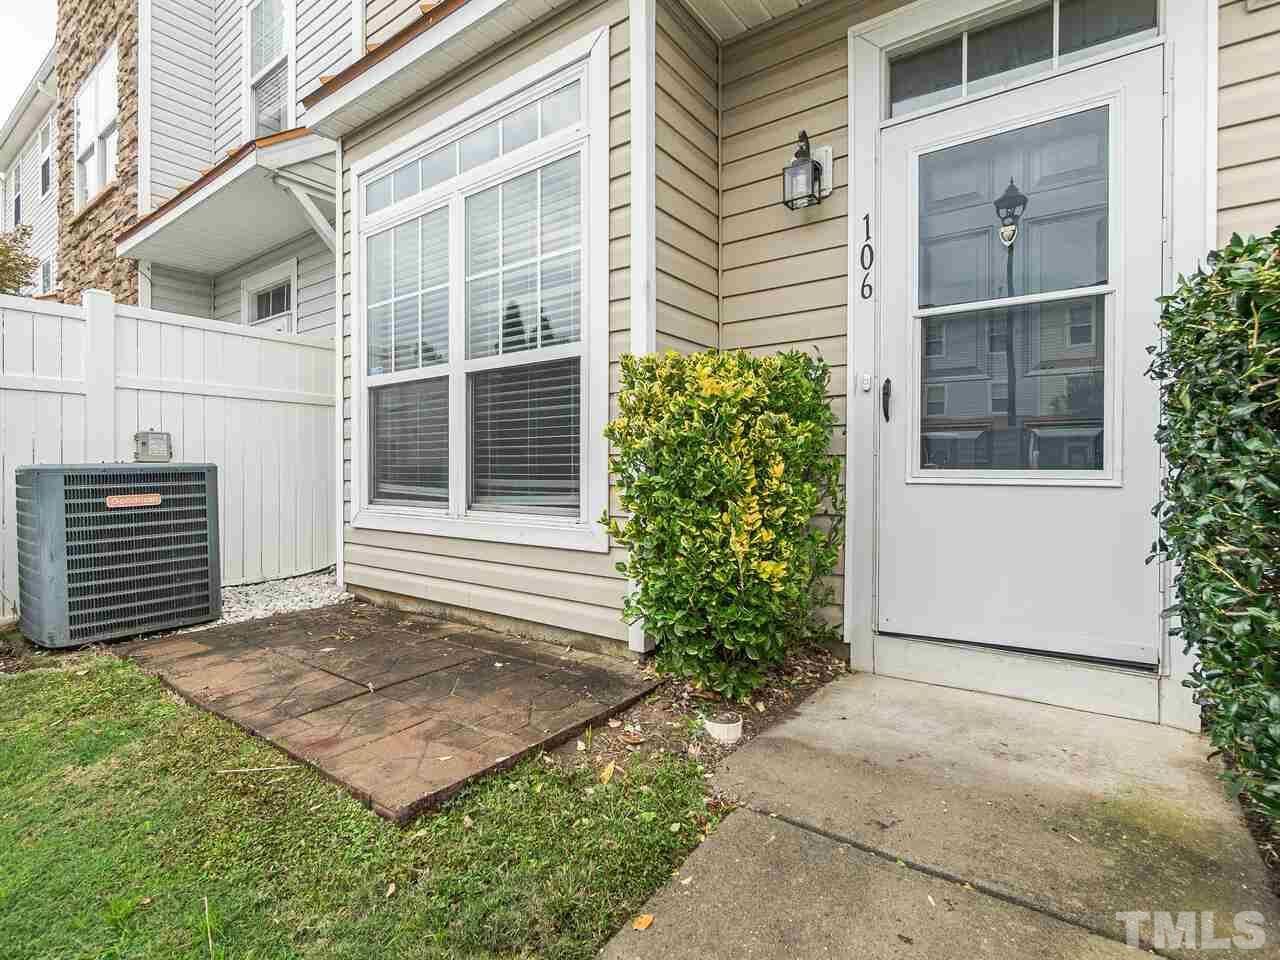 Photo of 11730 Mezzanine Drive #106, Raleigh, NC 27614 (MLS # 2351382)